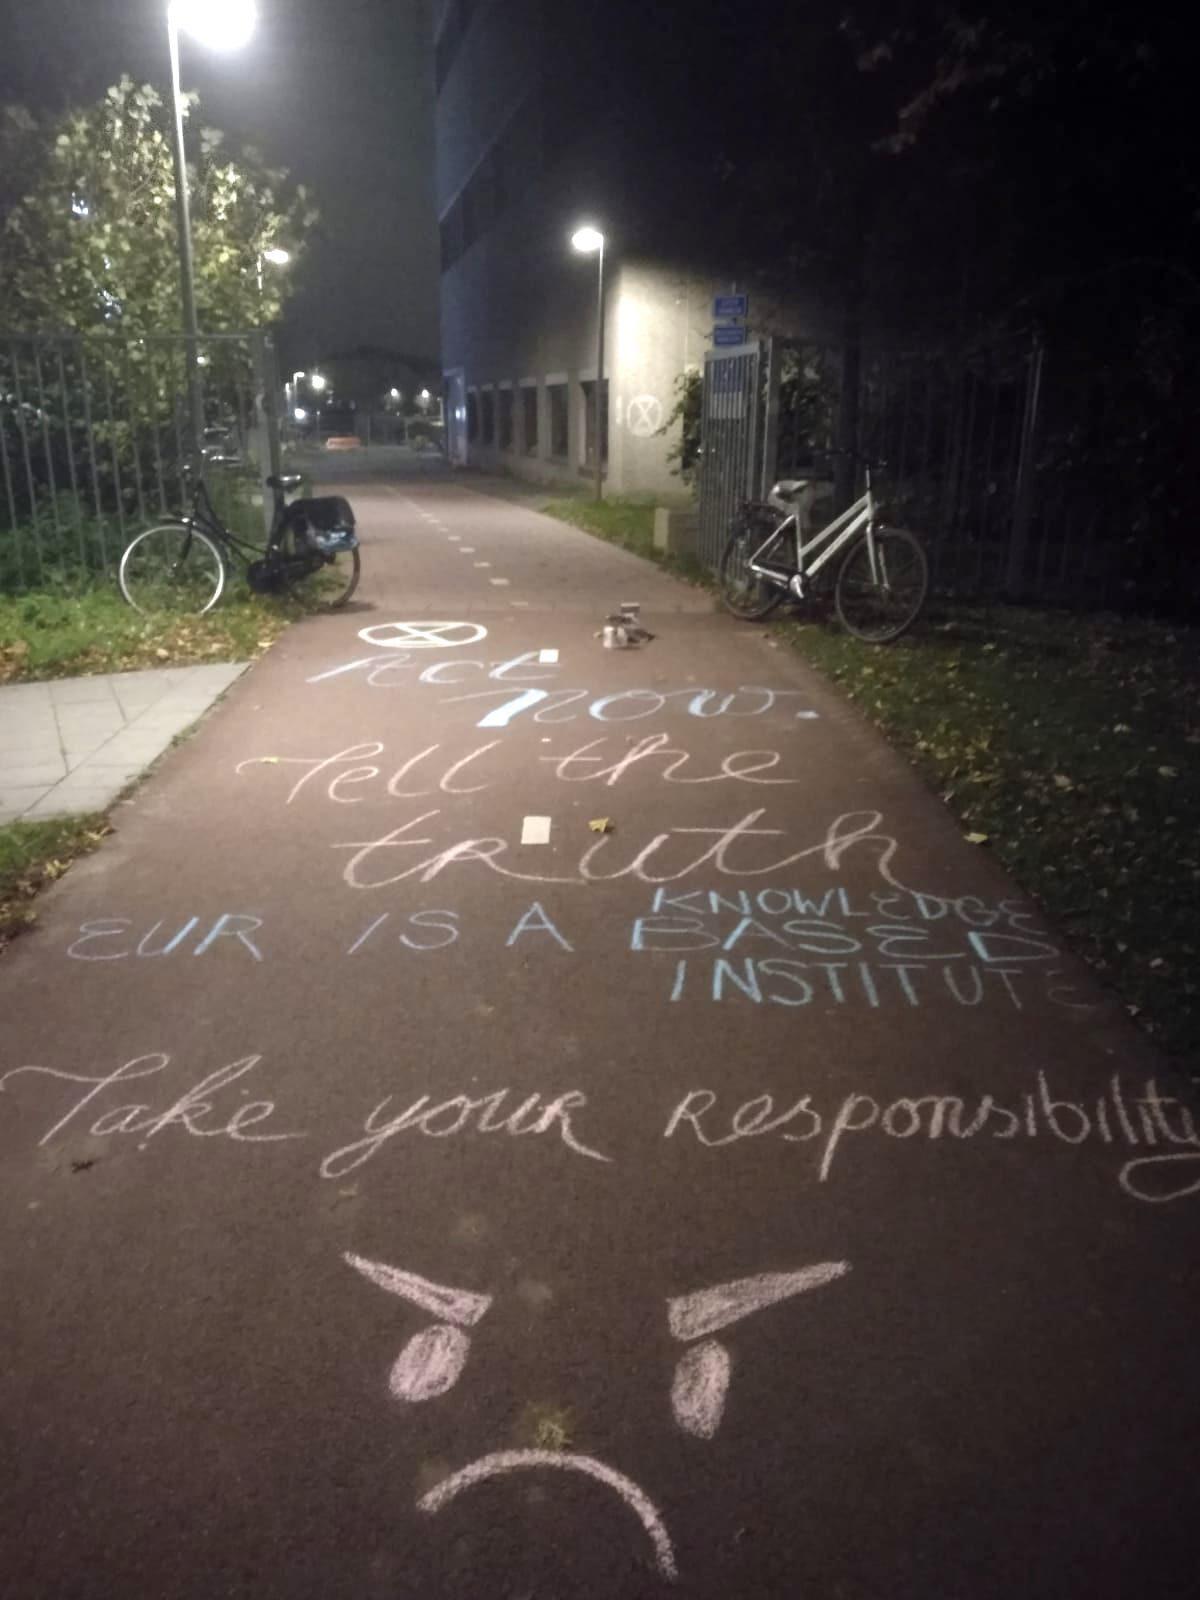 Chalk by University Rebellion